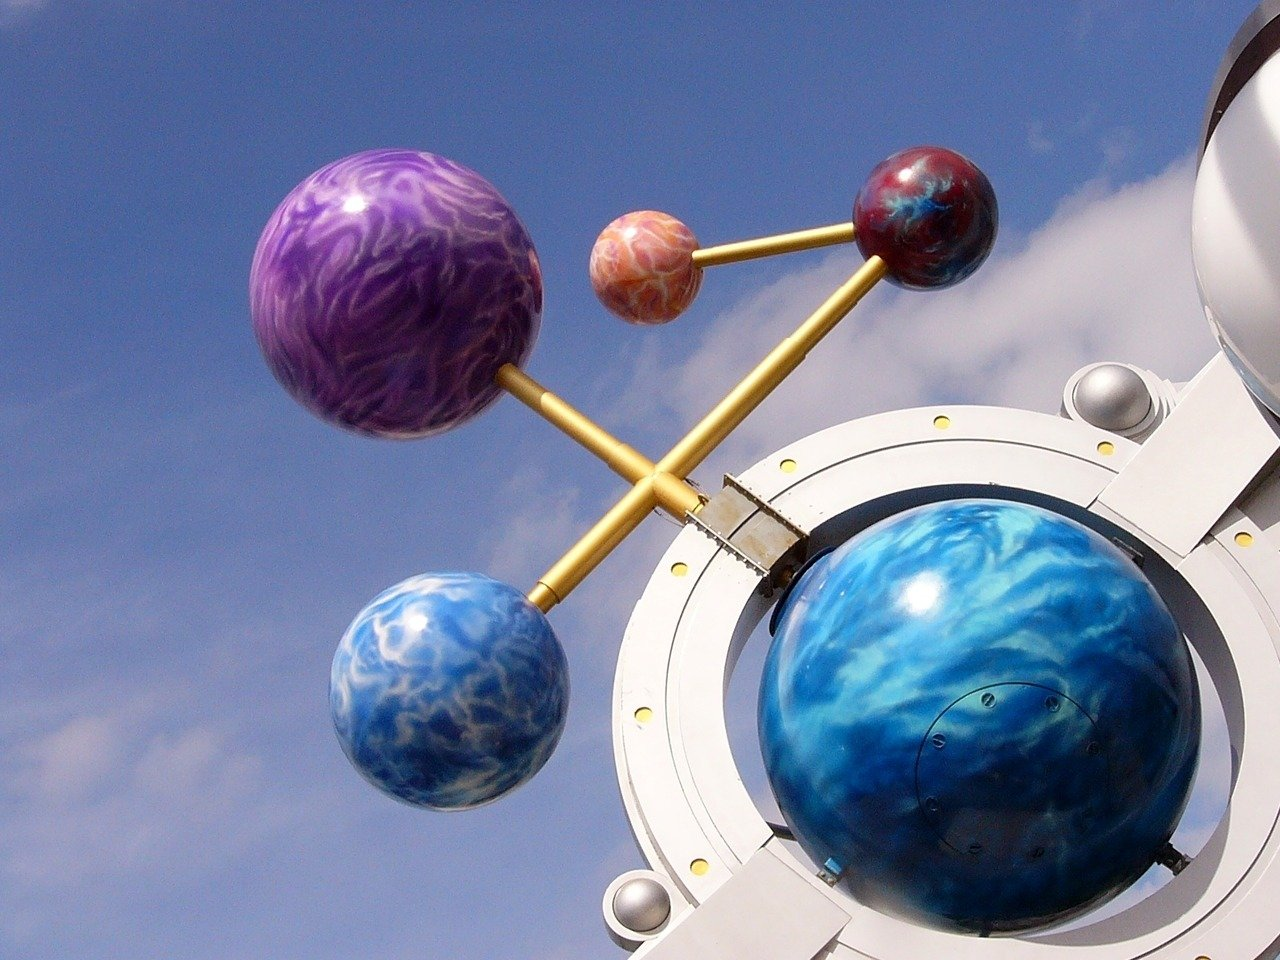 space maths: spheres in space